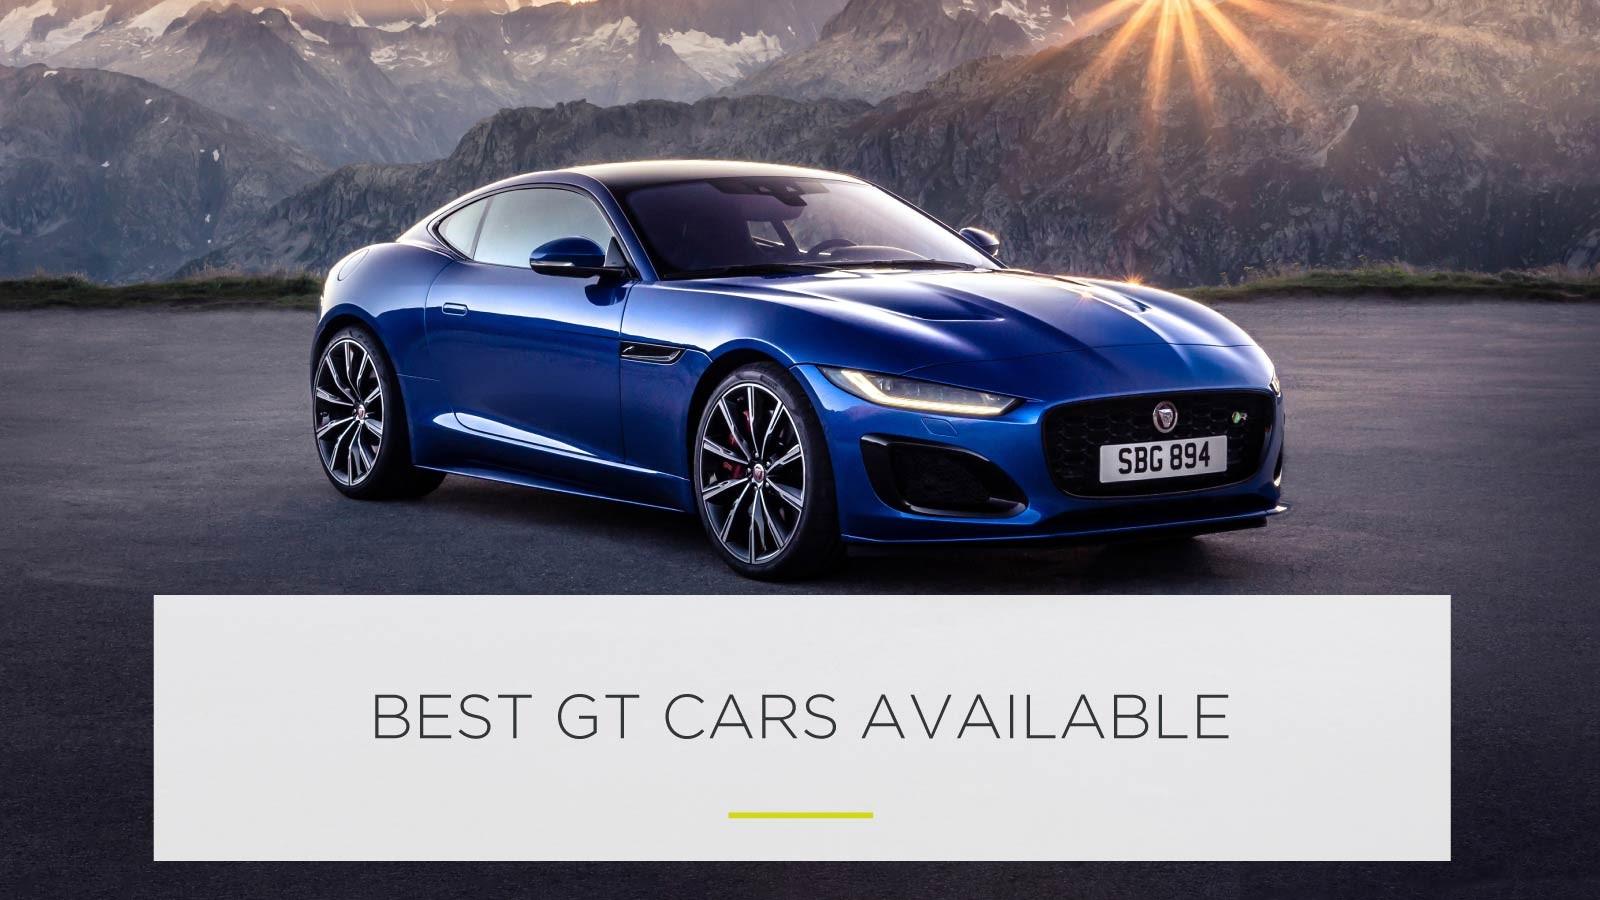 Best GT cars carousel